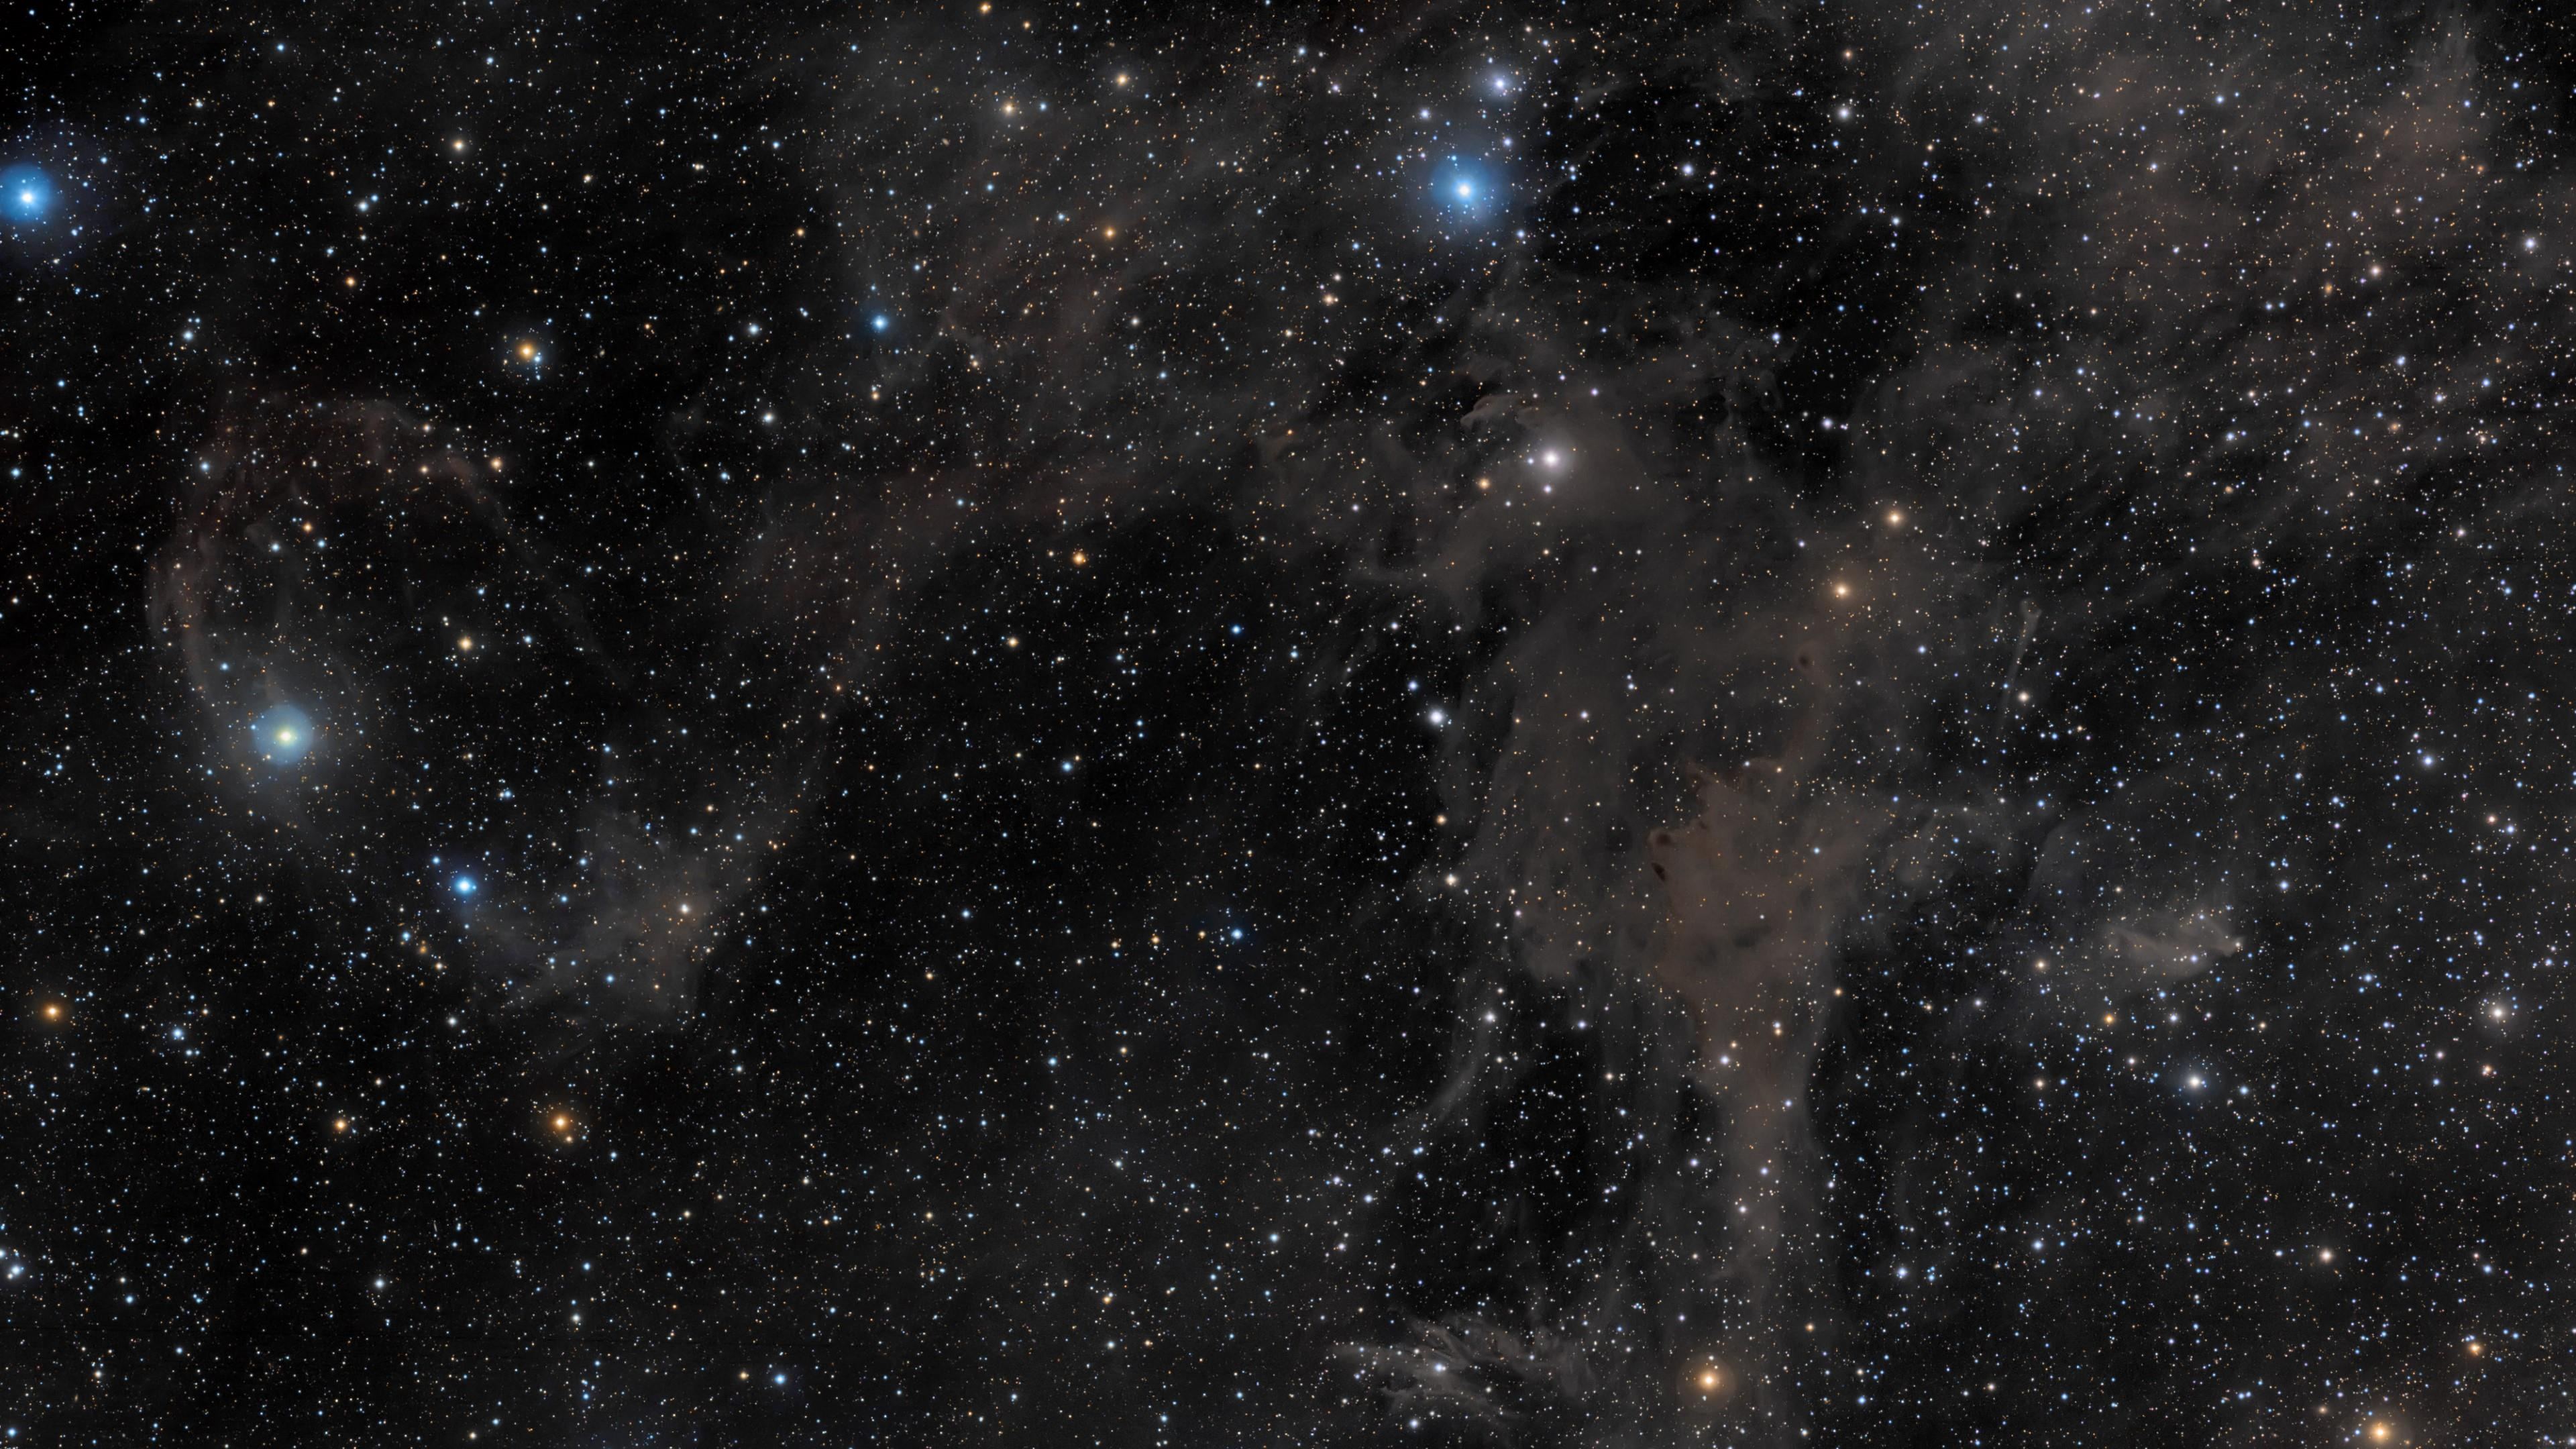 Starry sky wallpaper - backiee